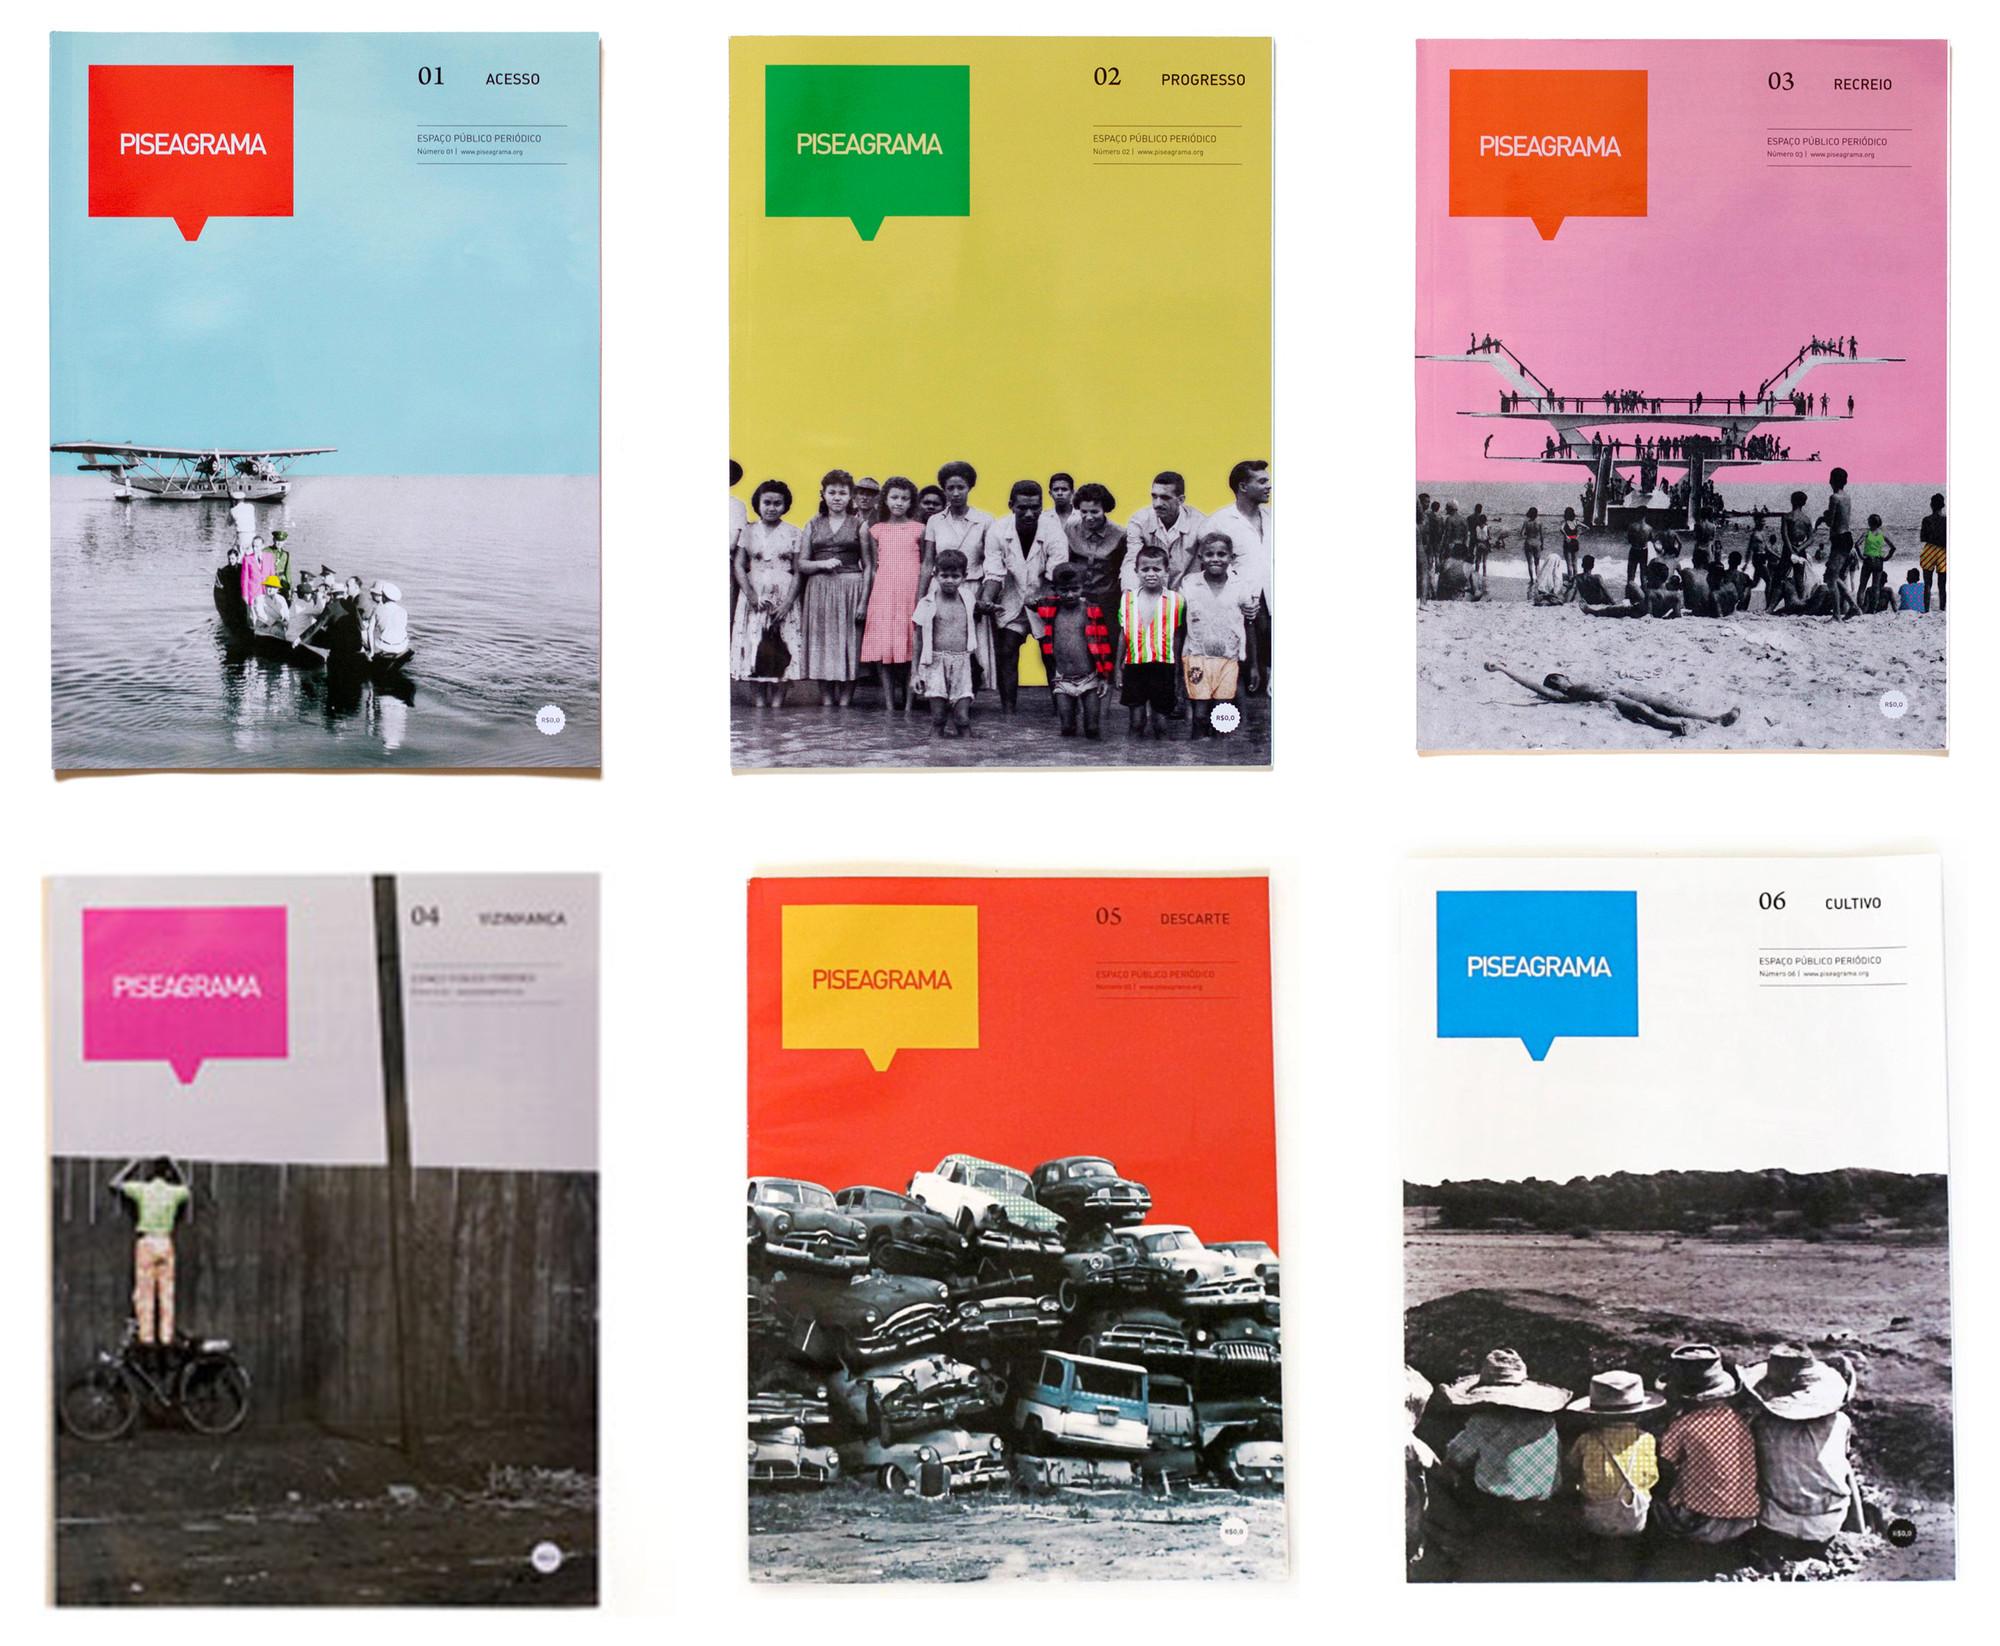 PISEAGRAMA lança campanha de financiamento colaborativo, Cortesia de Revista PISEAGRAMA